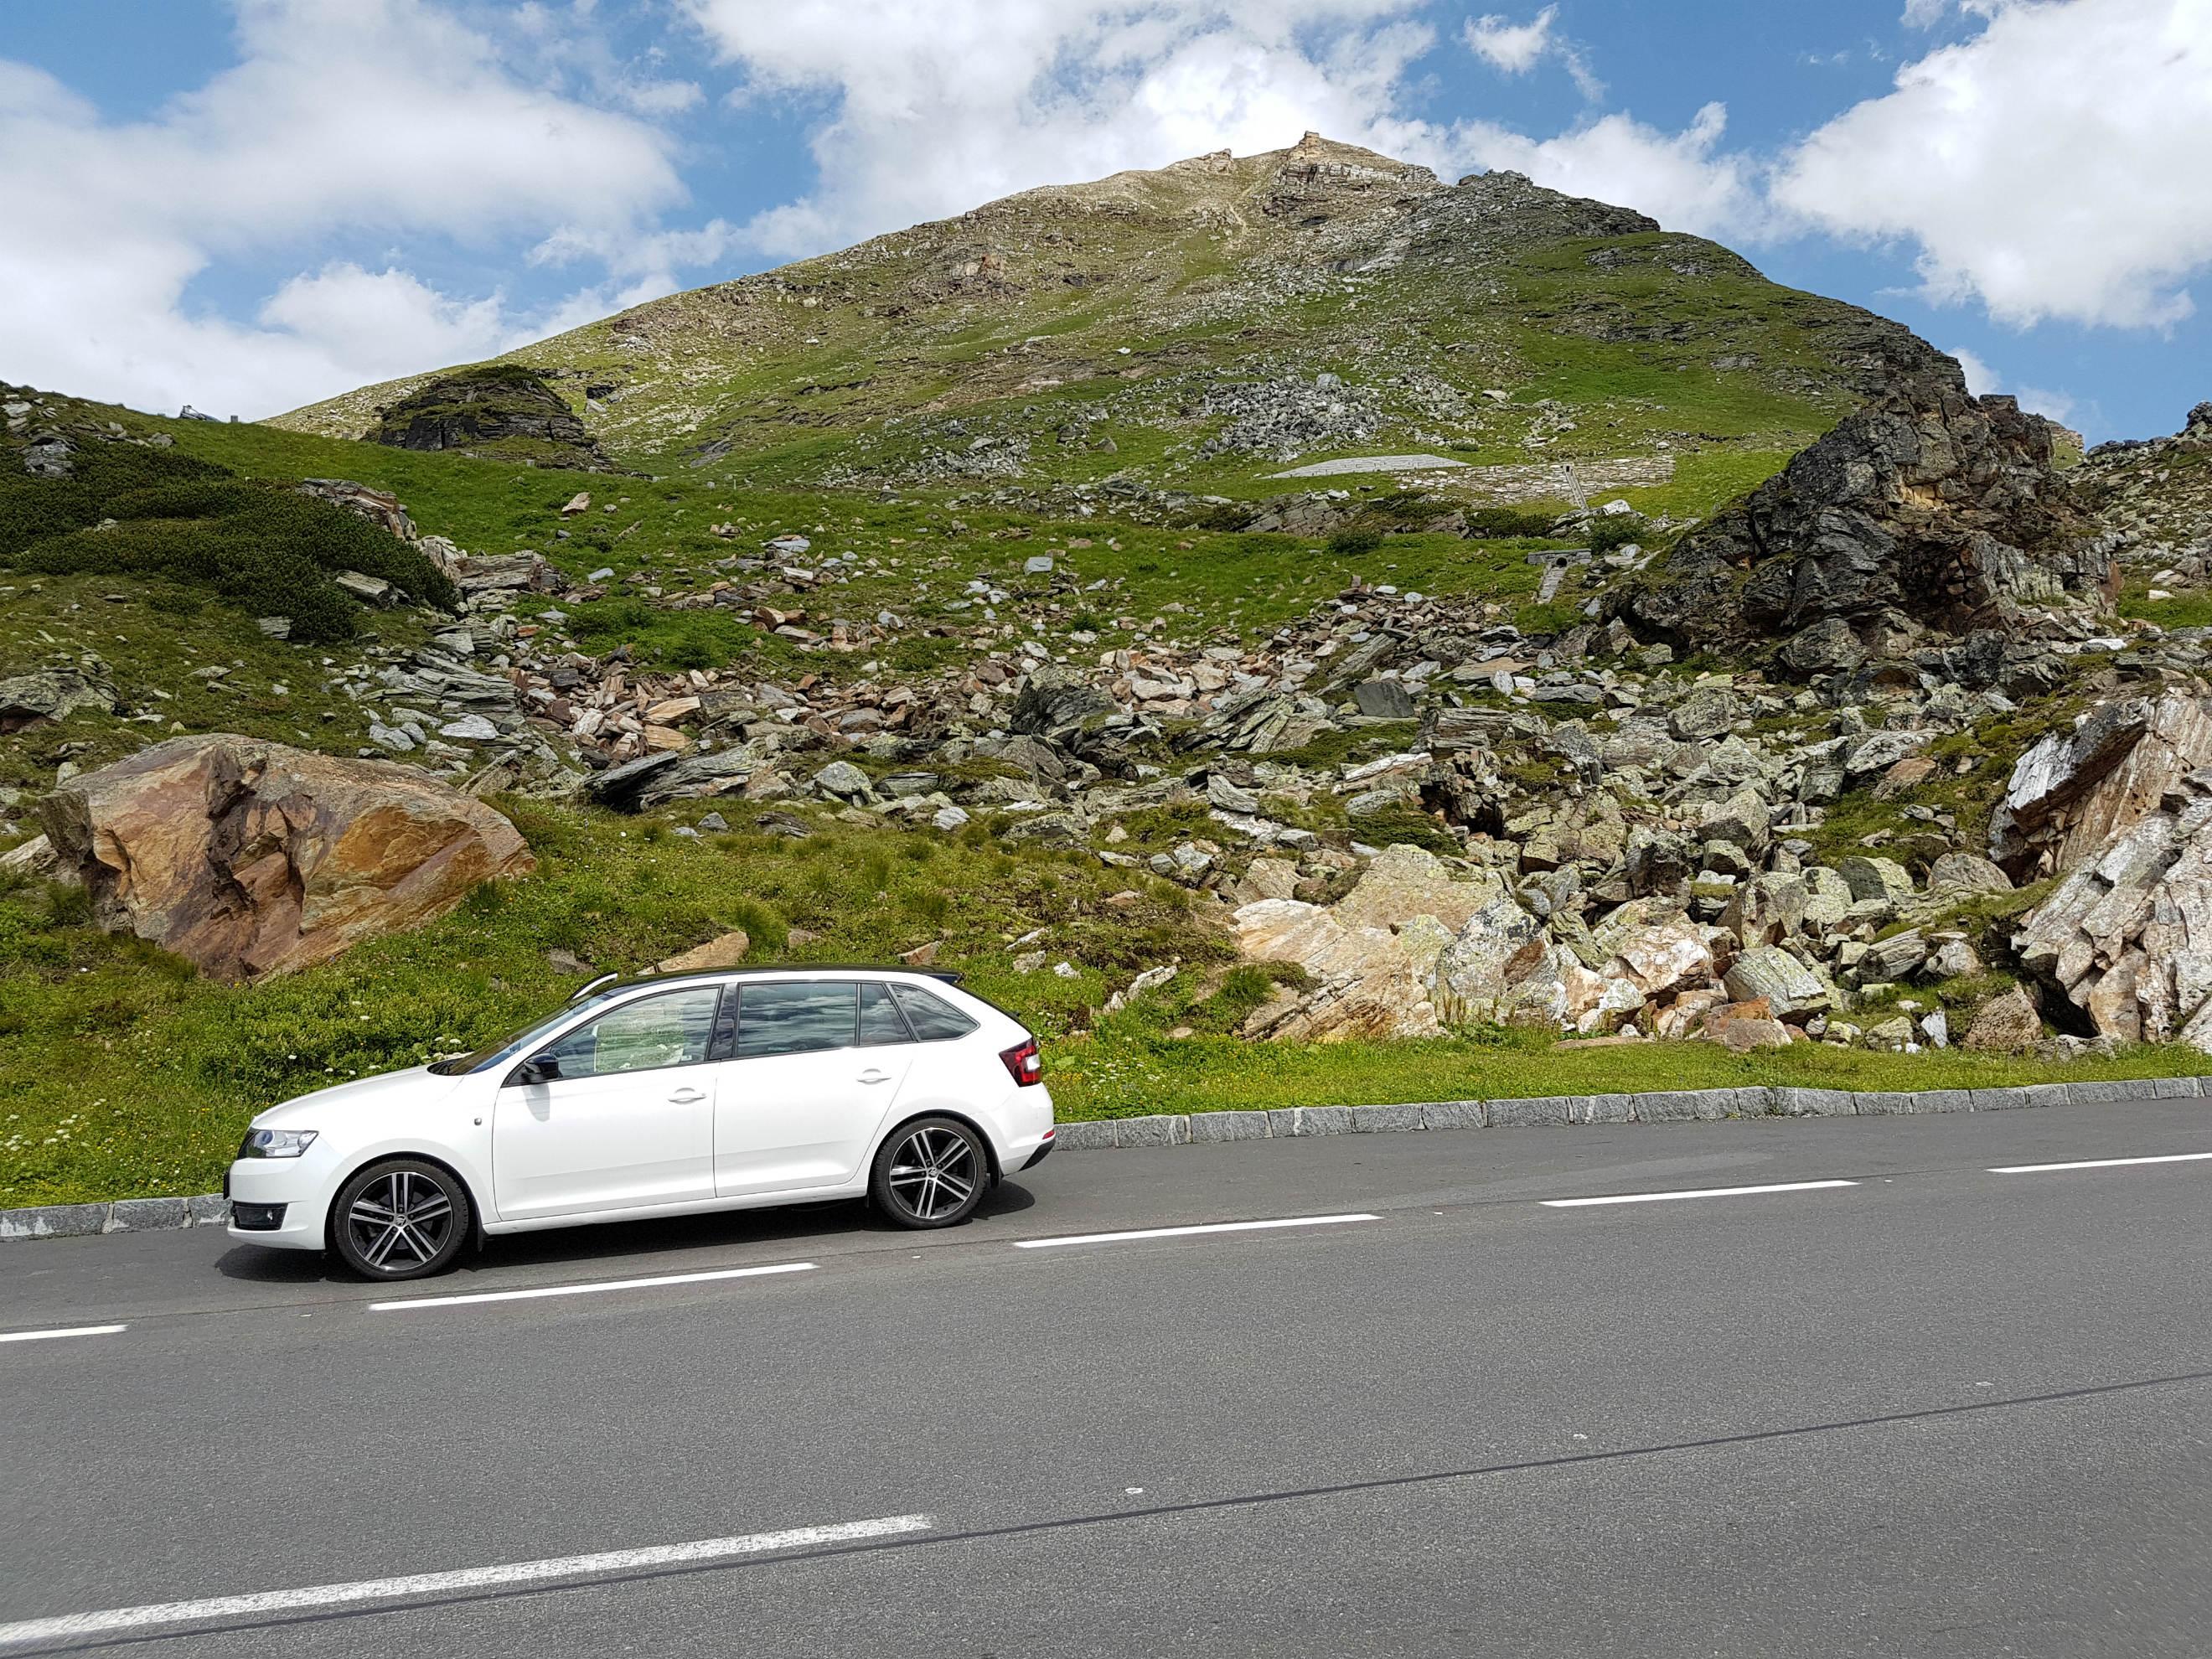 grossglockner-horsky-prechod-cesta-rakusko